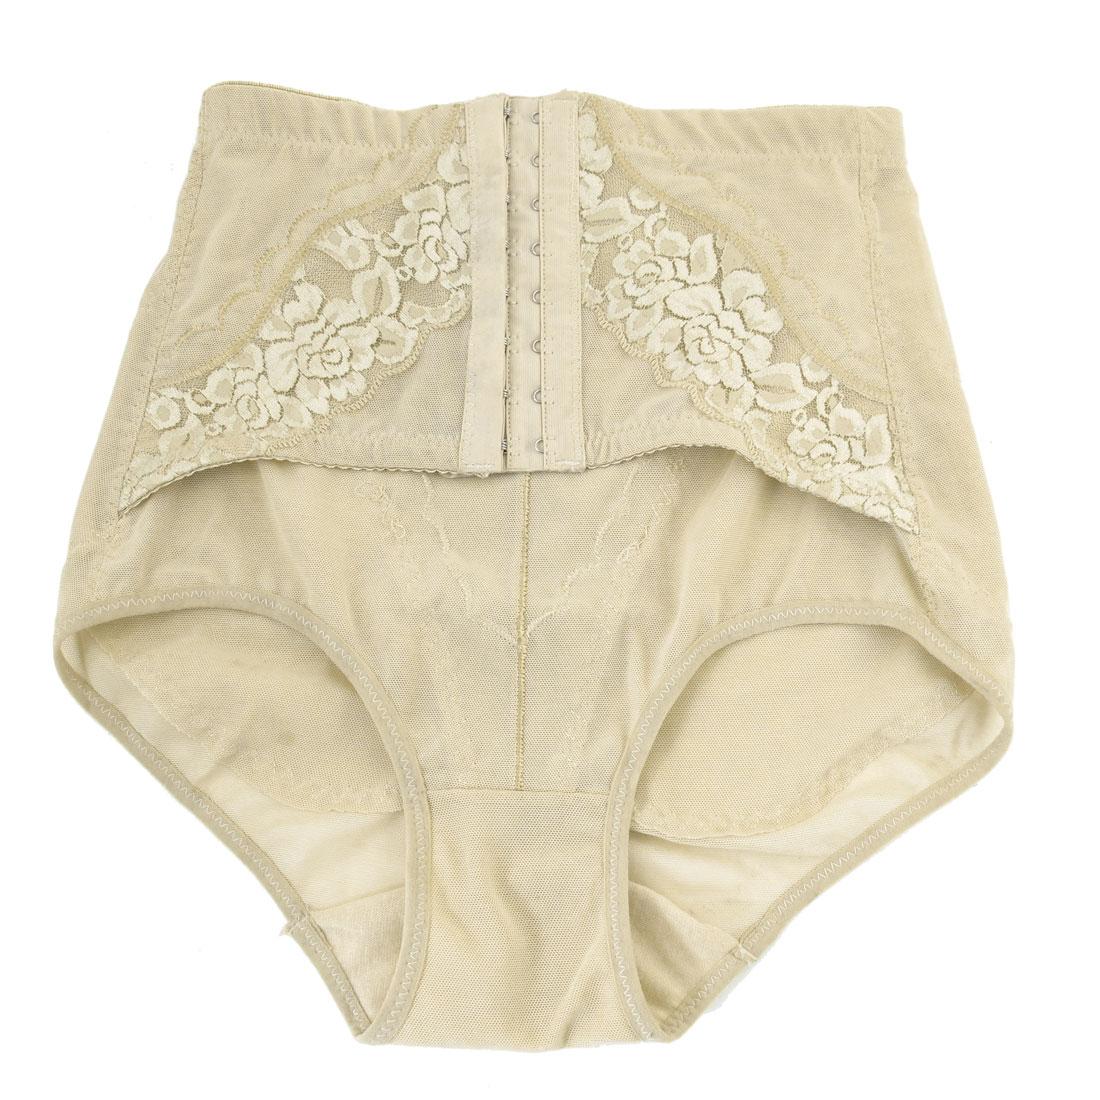 Lace Flowers Detail Elastic Corset Underwear Brief Beige XS for Women